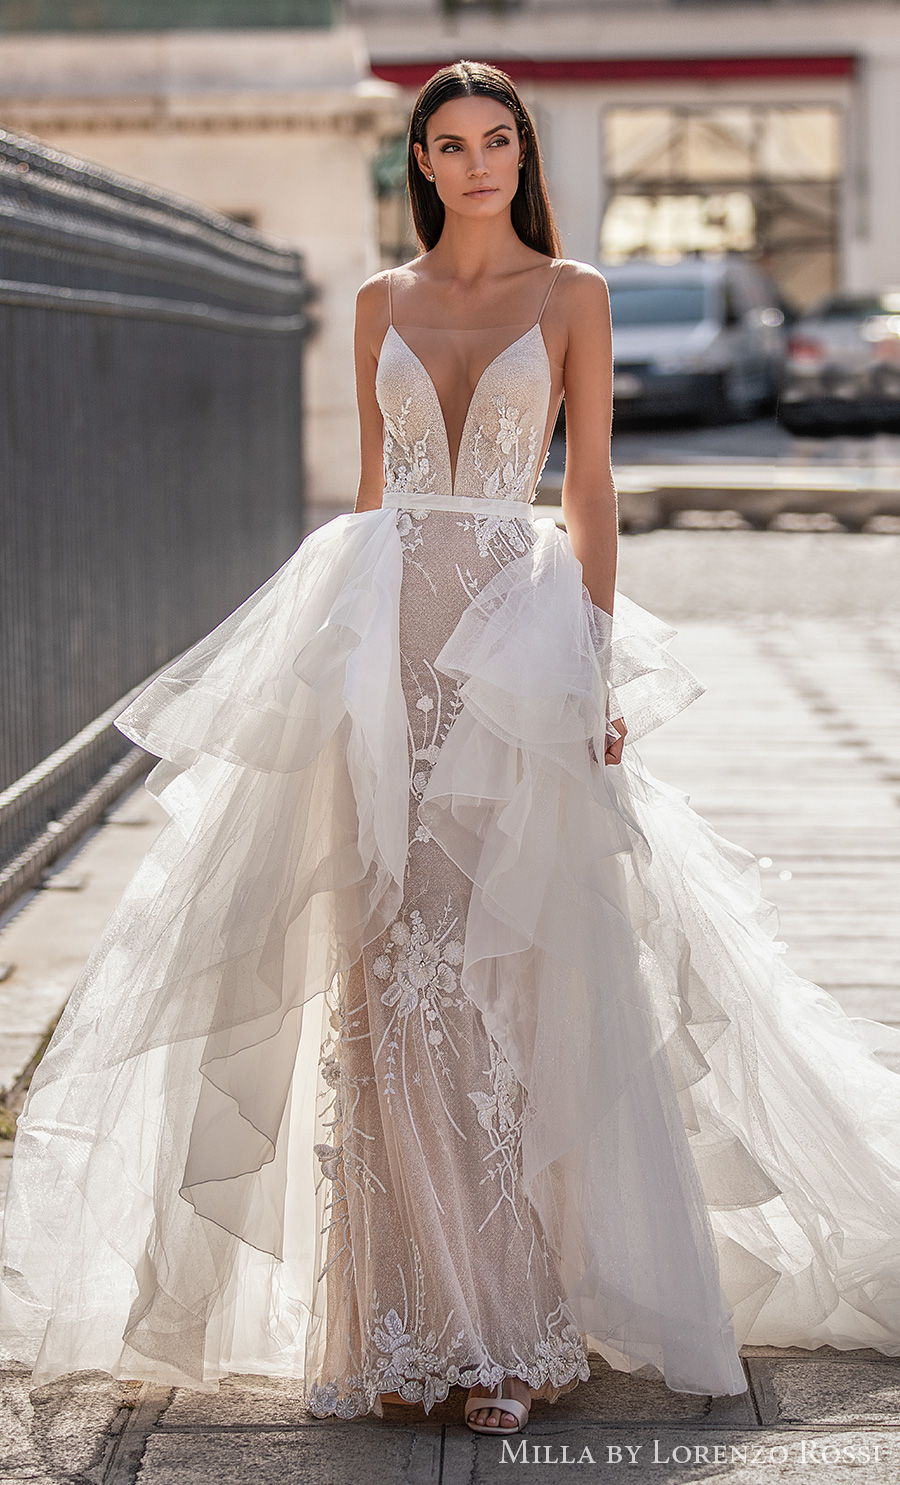 milla lorenzo rossi 2021 bridal sleeveless spaghetti strap deep plunging sweetheart neckline full embellishment romantic sheath wedding dress a  line overskirt low back sweep train (daisy) mv